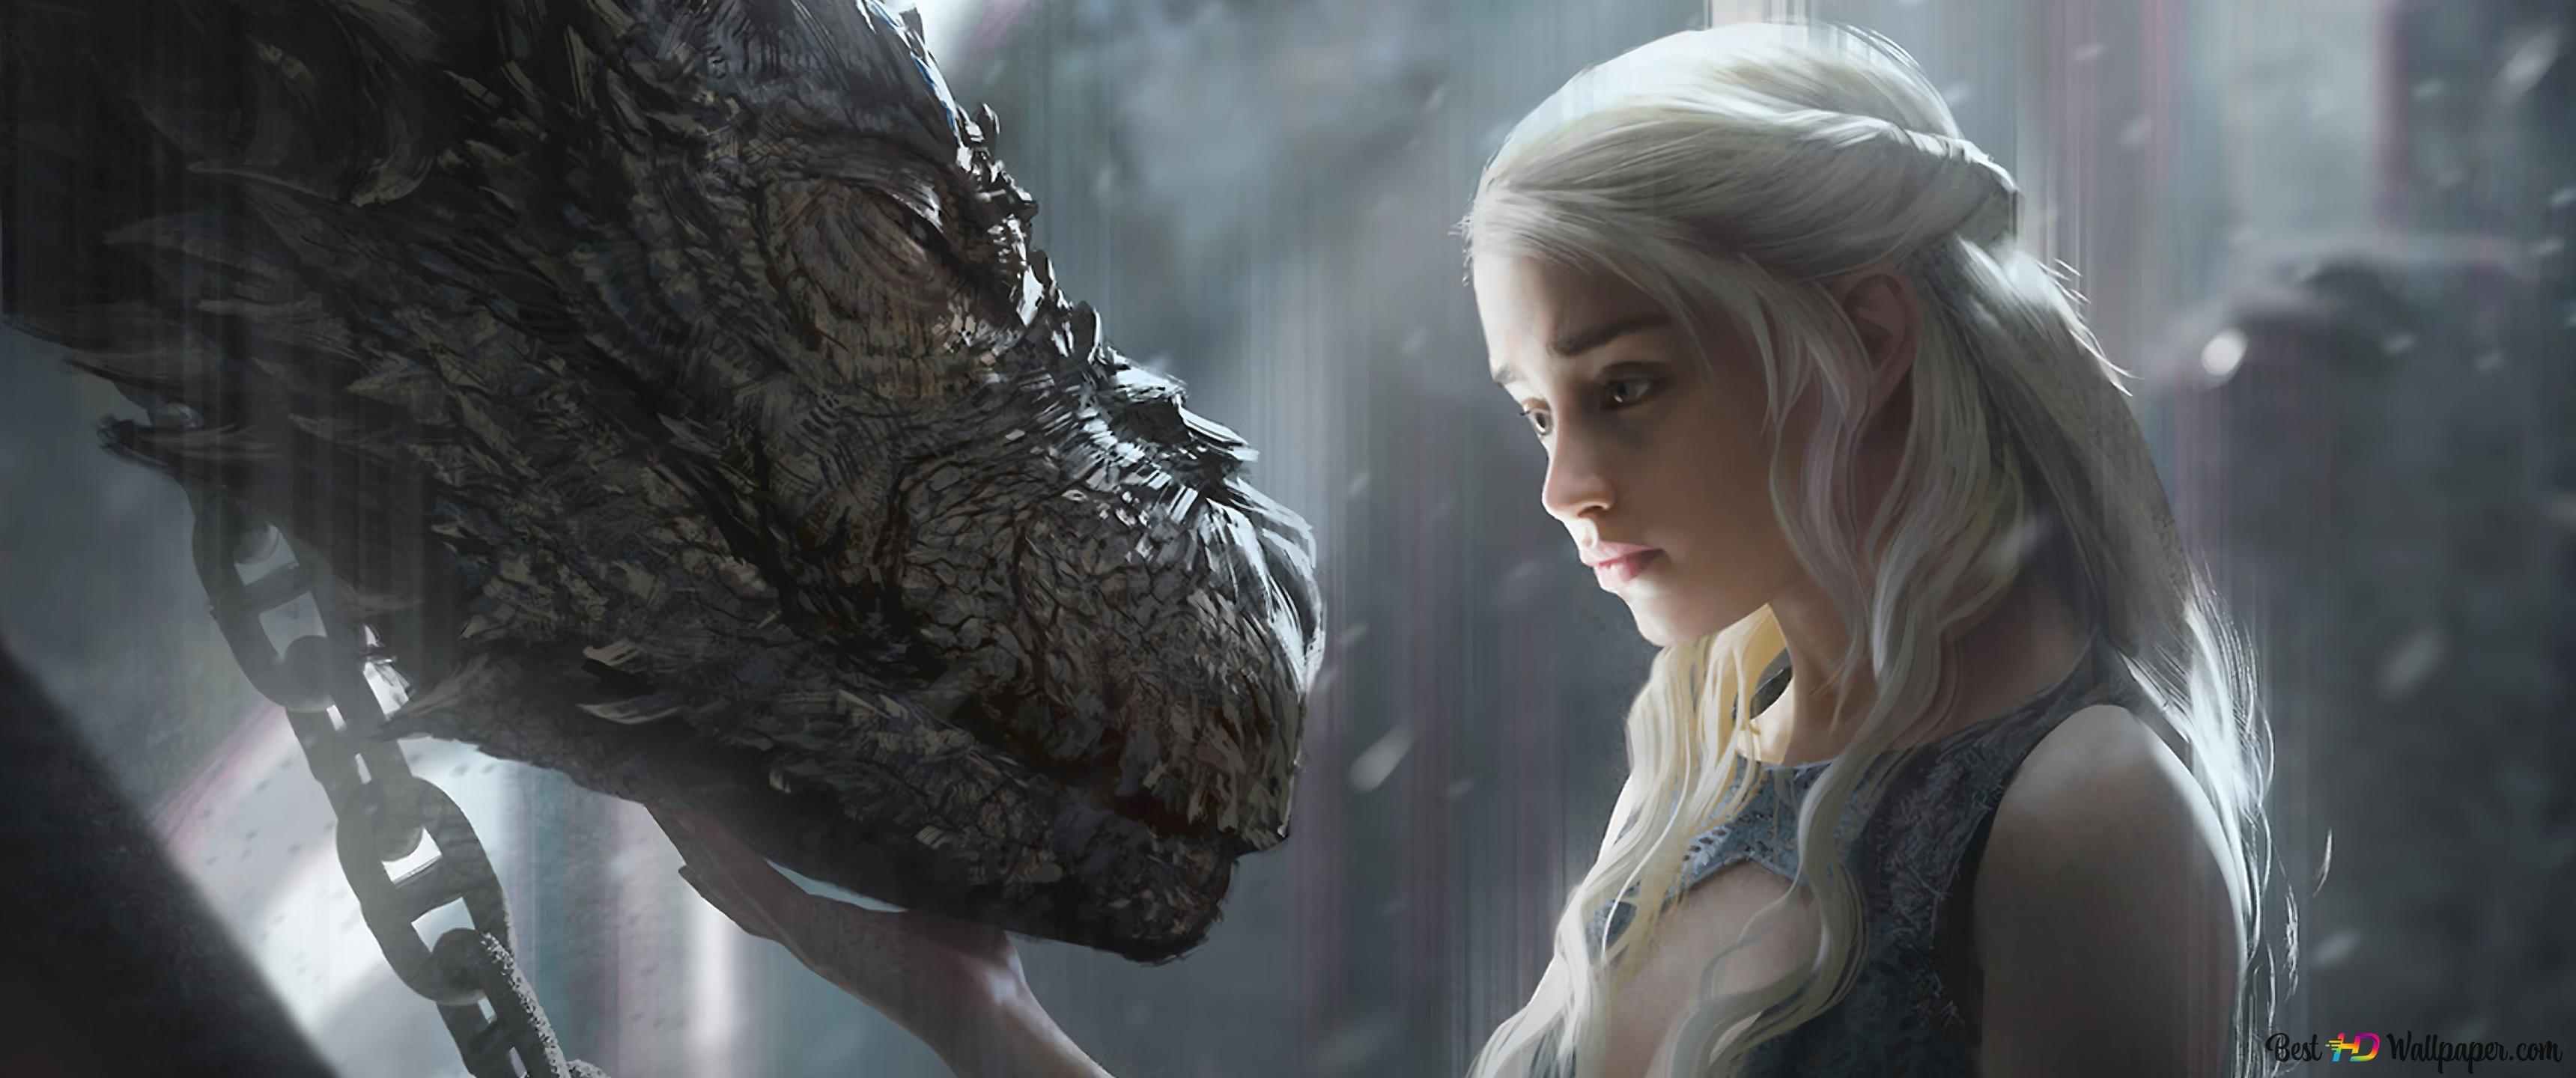 Game Of Thrones Daenerys Targaryen Drachen Hd